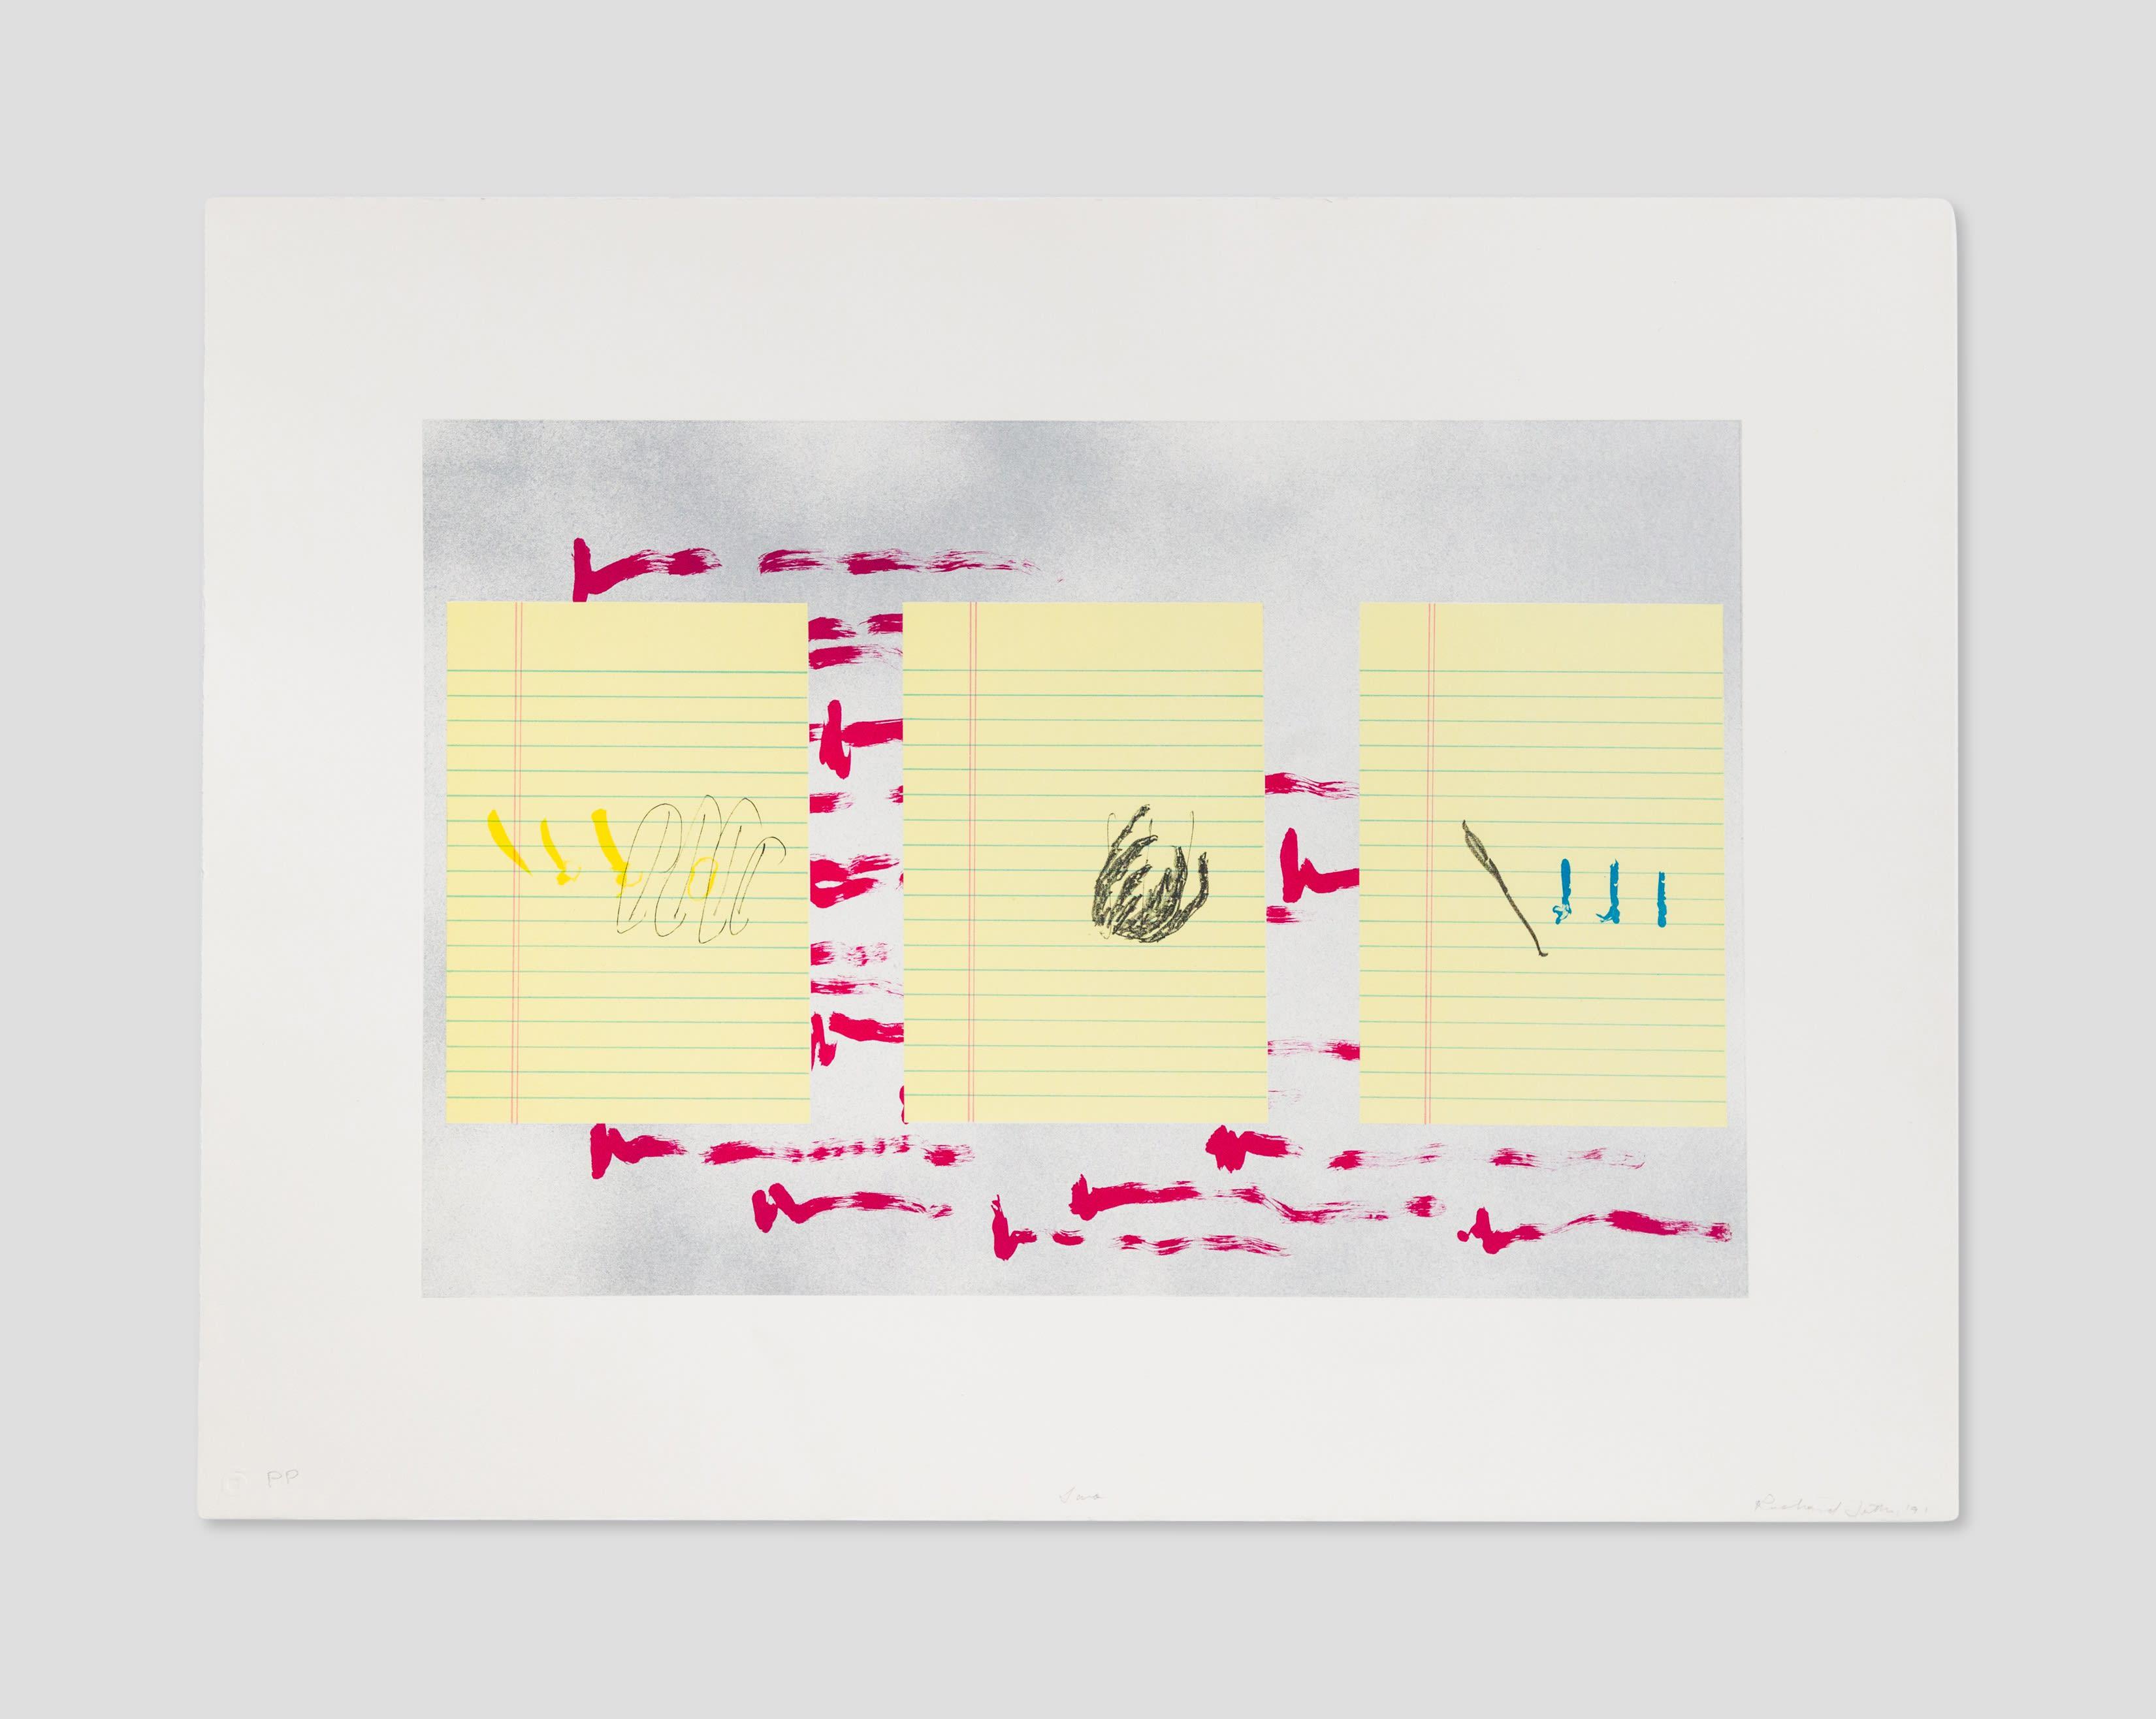 Artwork by Richard Tuttle at Zane Bennett Contemporary Art